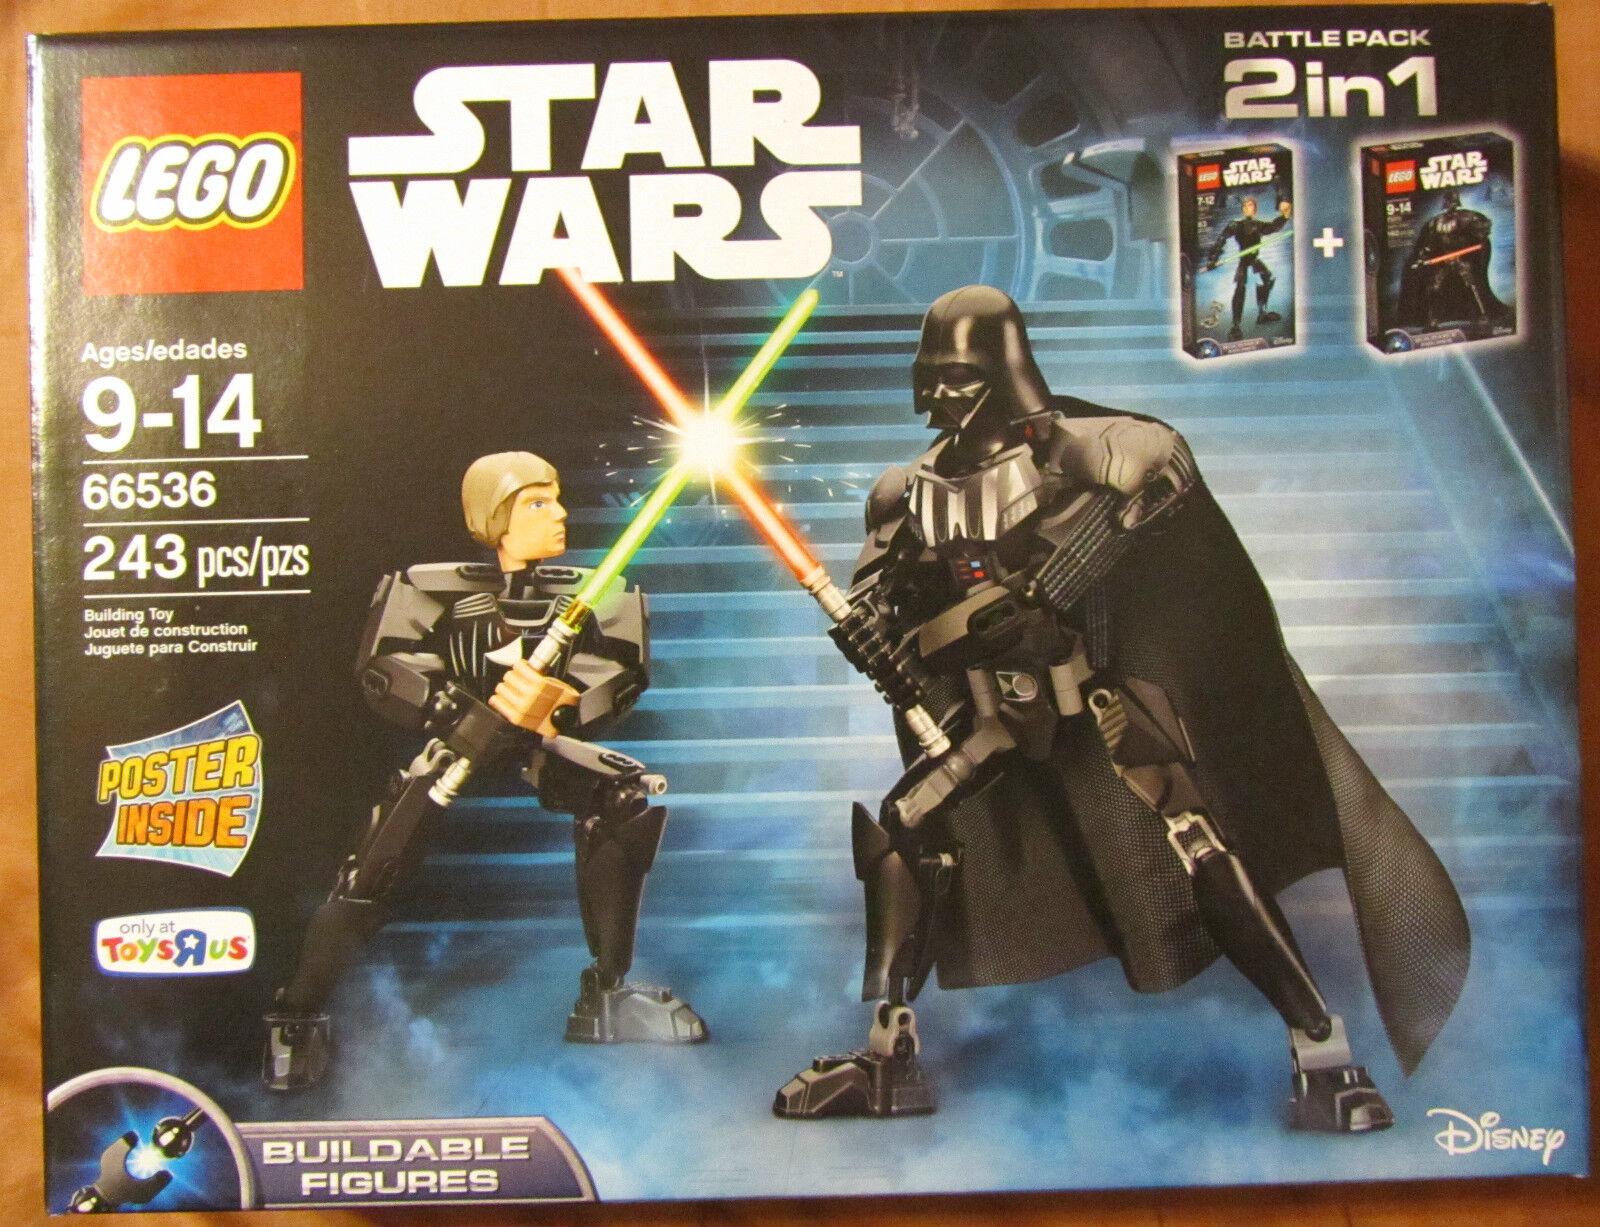 Lego Star Wars 66536 2 en 1 Darth Vader & Luke Skywalker  243 PIECES  Tru EXC